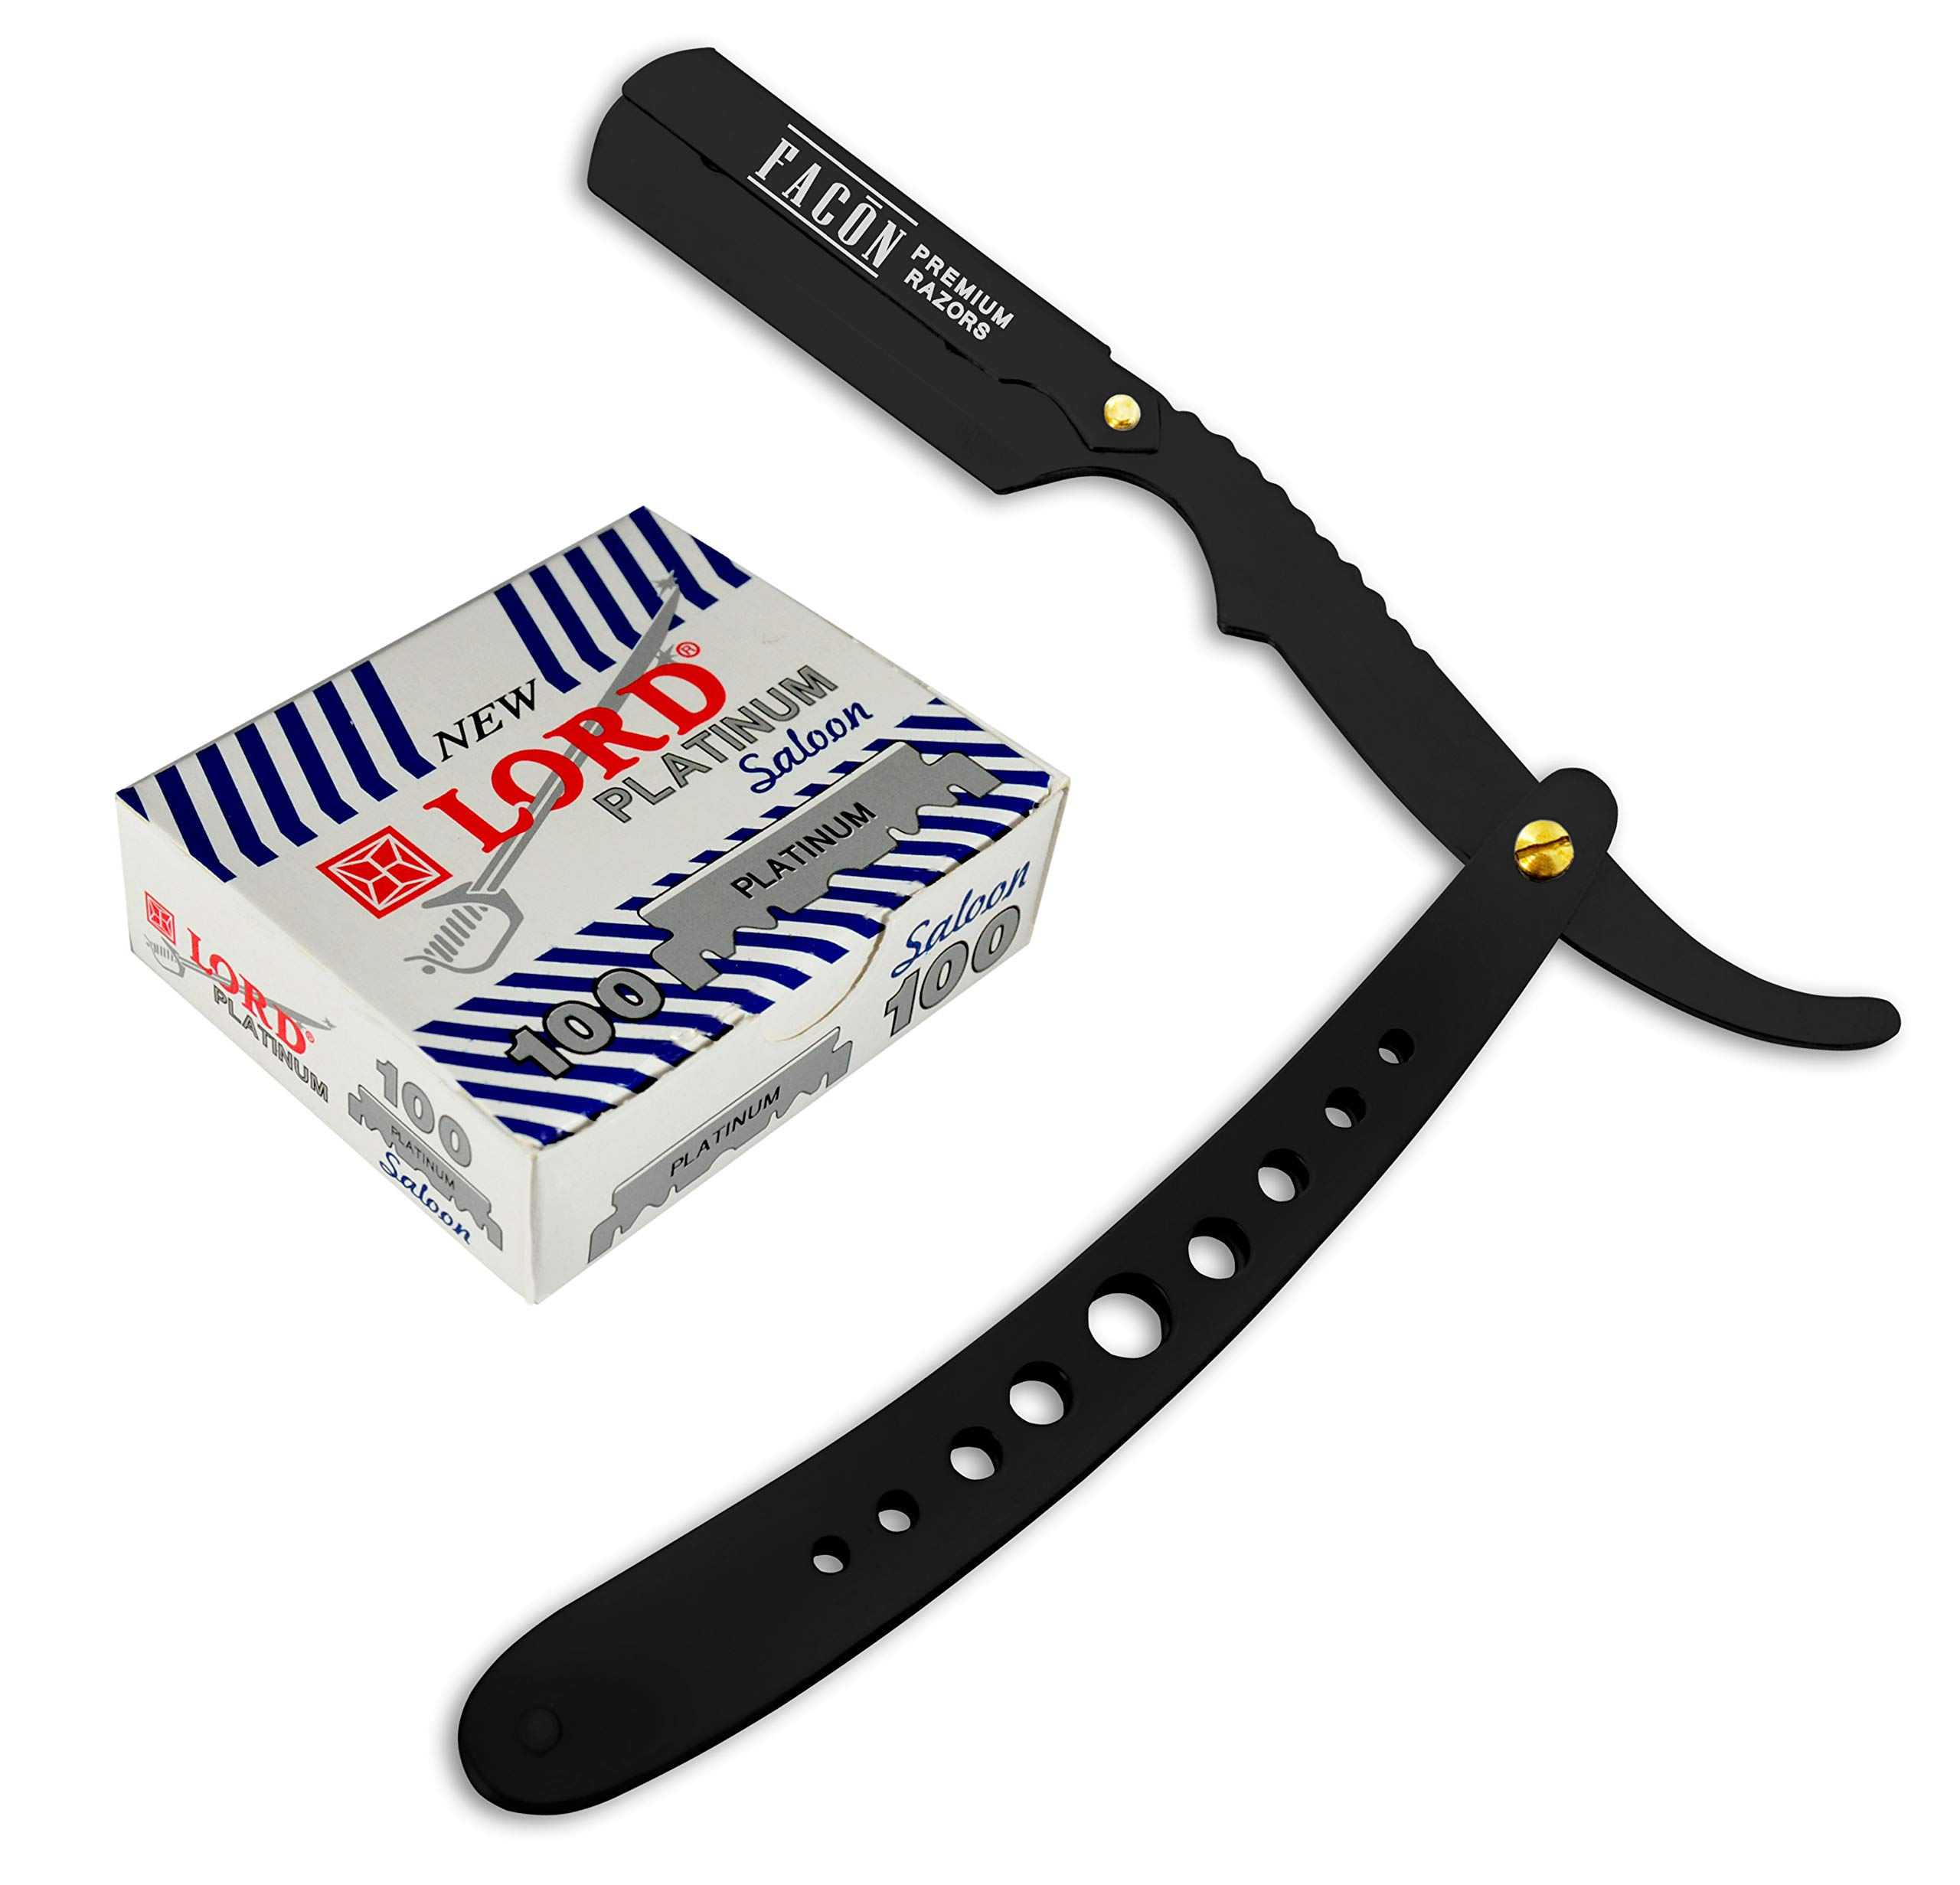 100 BLADES + Facón Professional Classic Straight Edge Barber Razor - Salon Quality Cut Throat Shavette by Facón Razors (Image #8)